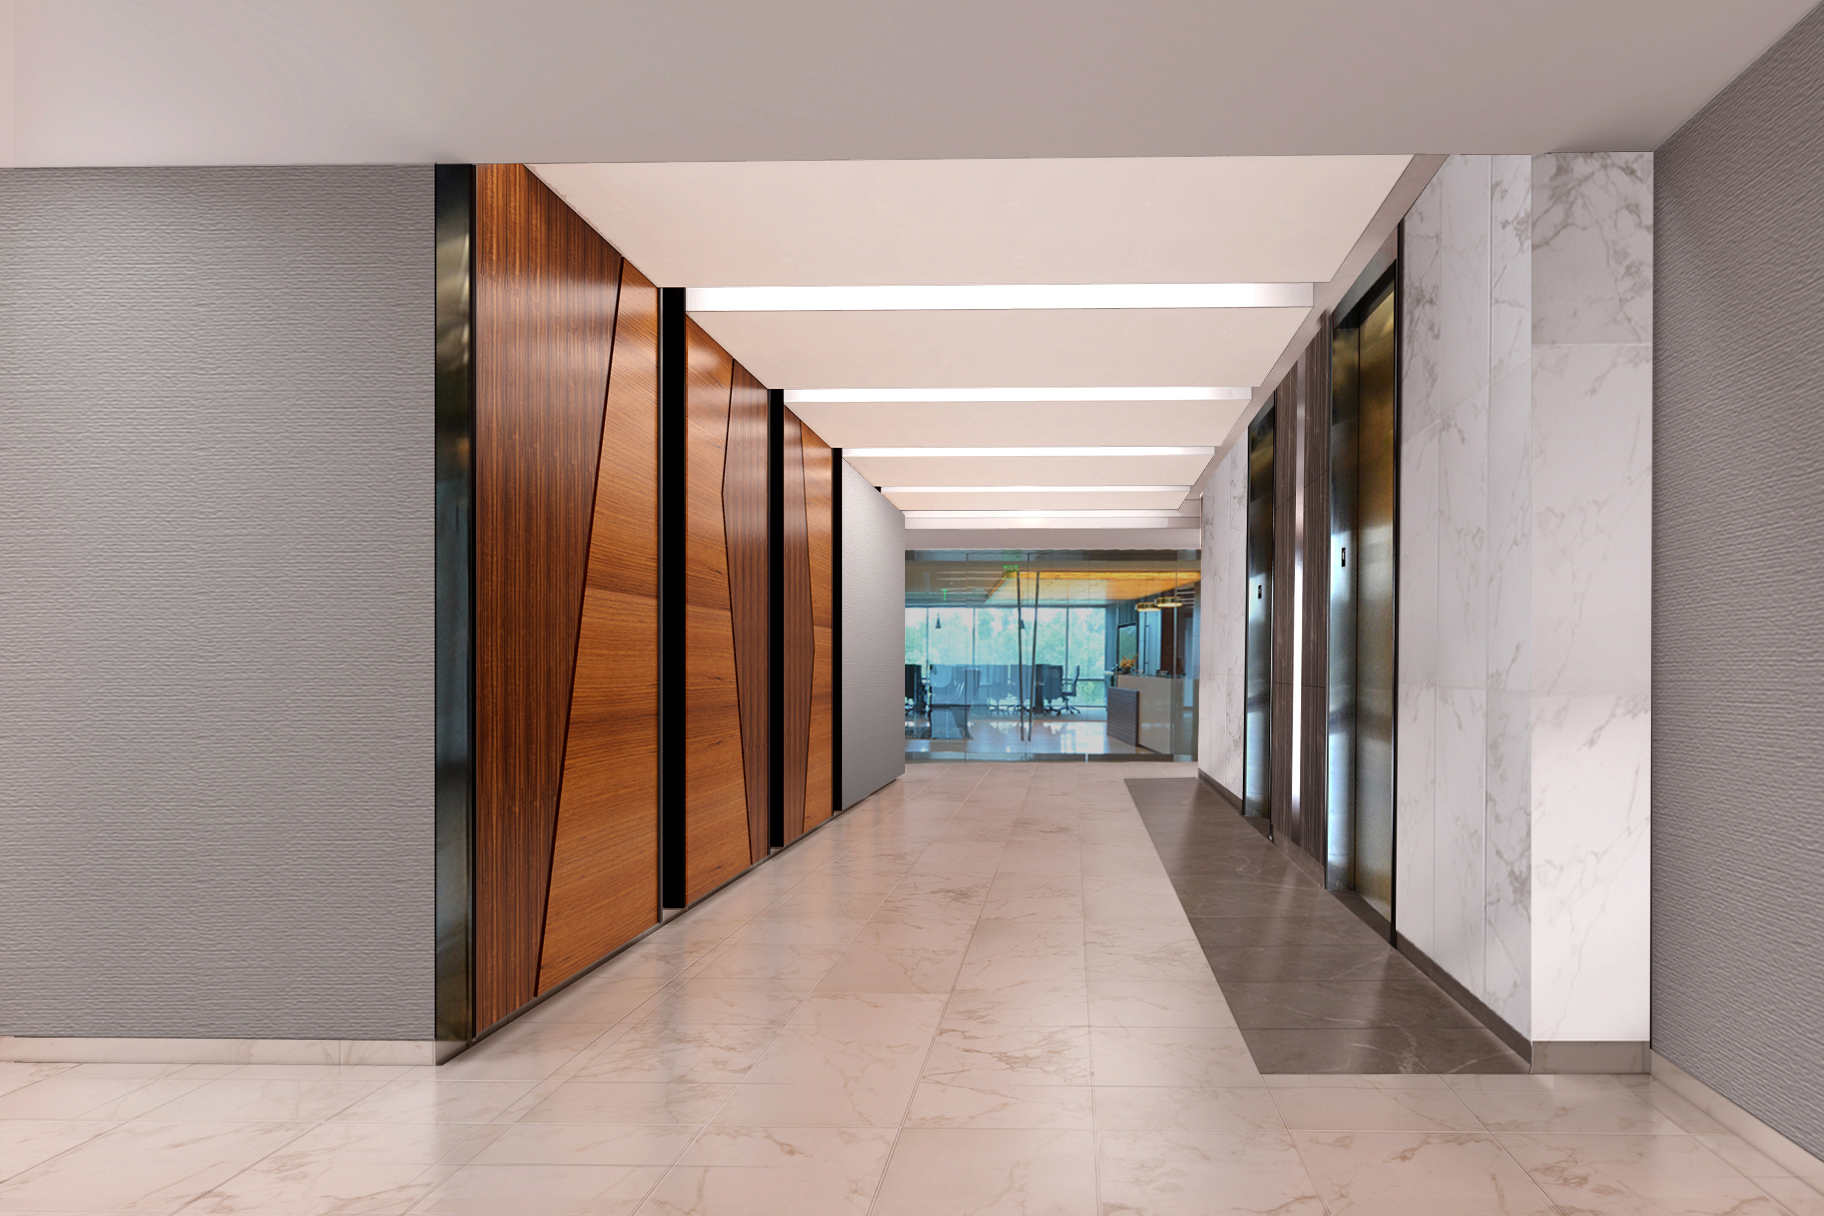 SHELBYHURST OFFICE BUILDING 435  120,000 SF I EST. COMPLETION 2020